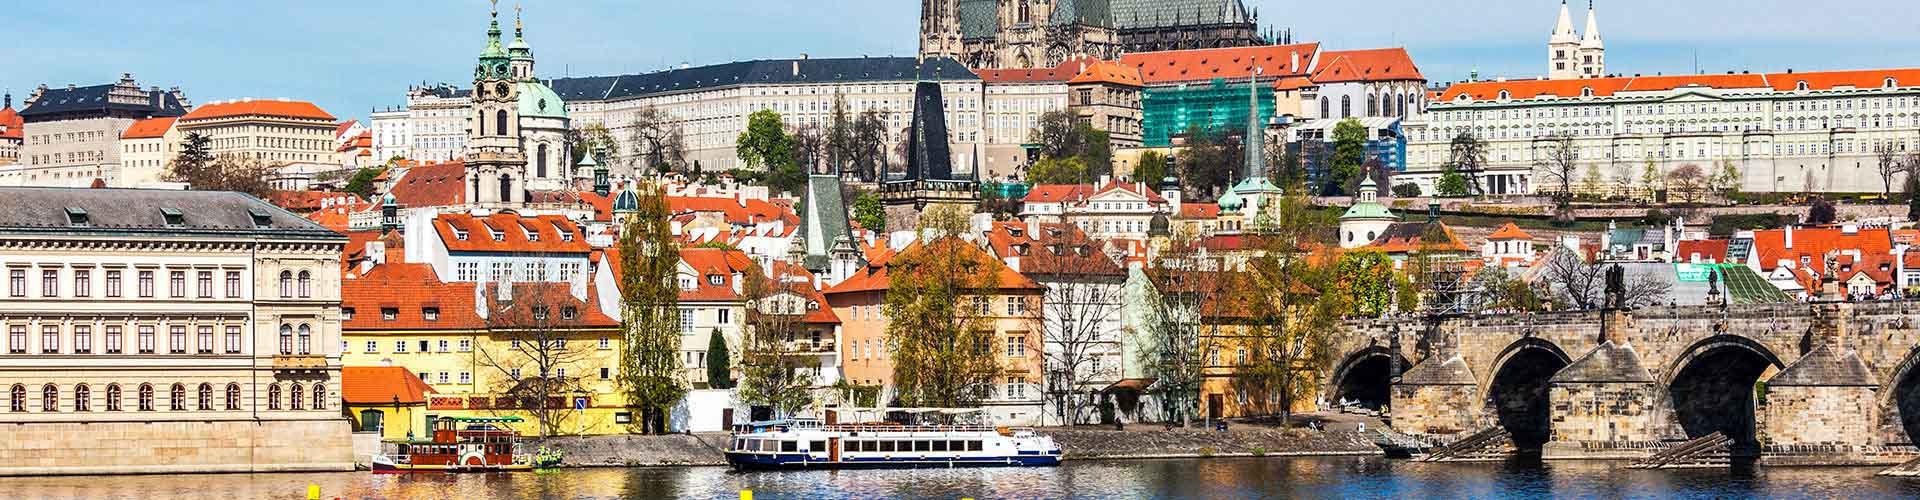 Praga - Hoteles baratos cerca a Catedral de San Vito. Mapas de Praga, Fotos y comentarios de cada Hotel en Praga.